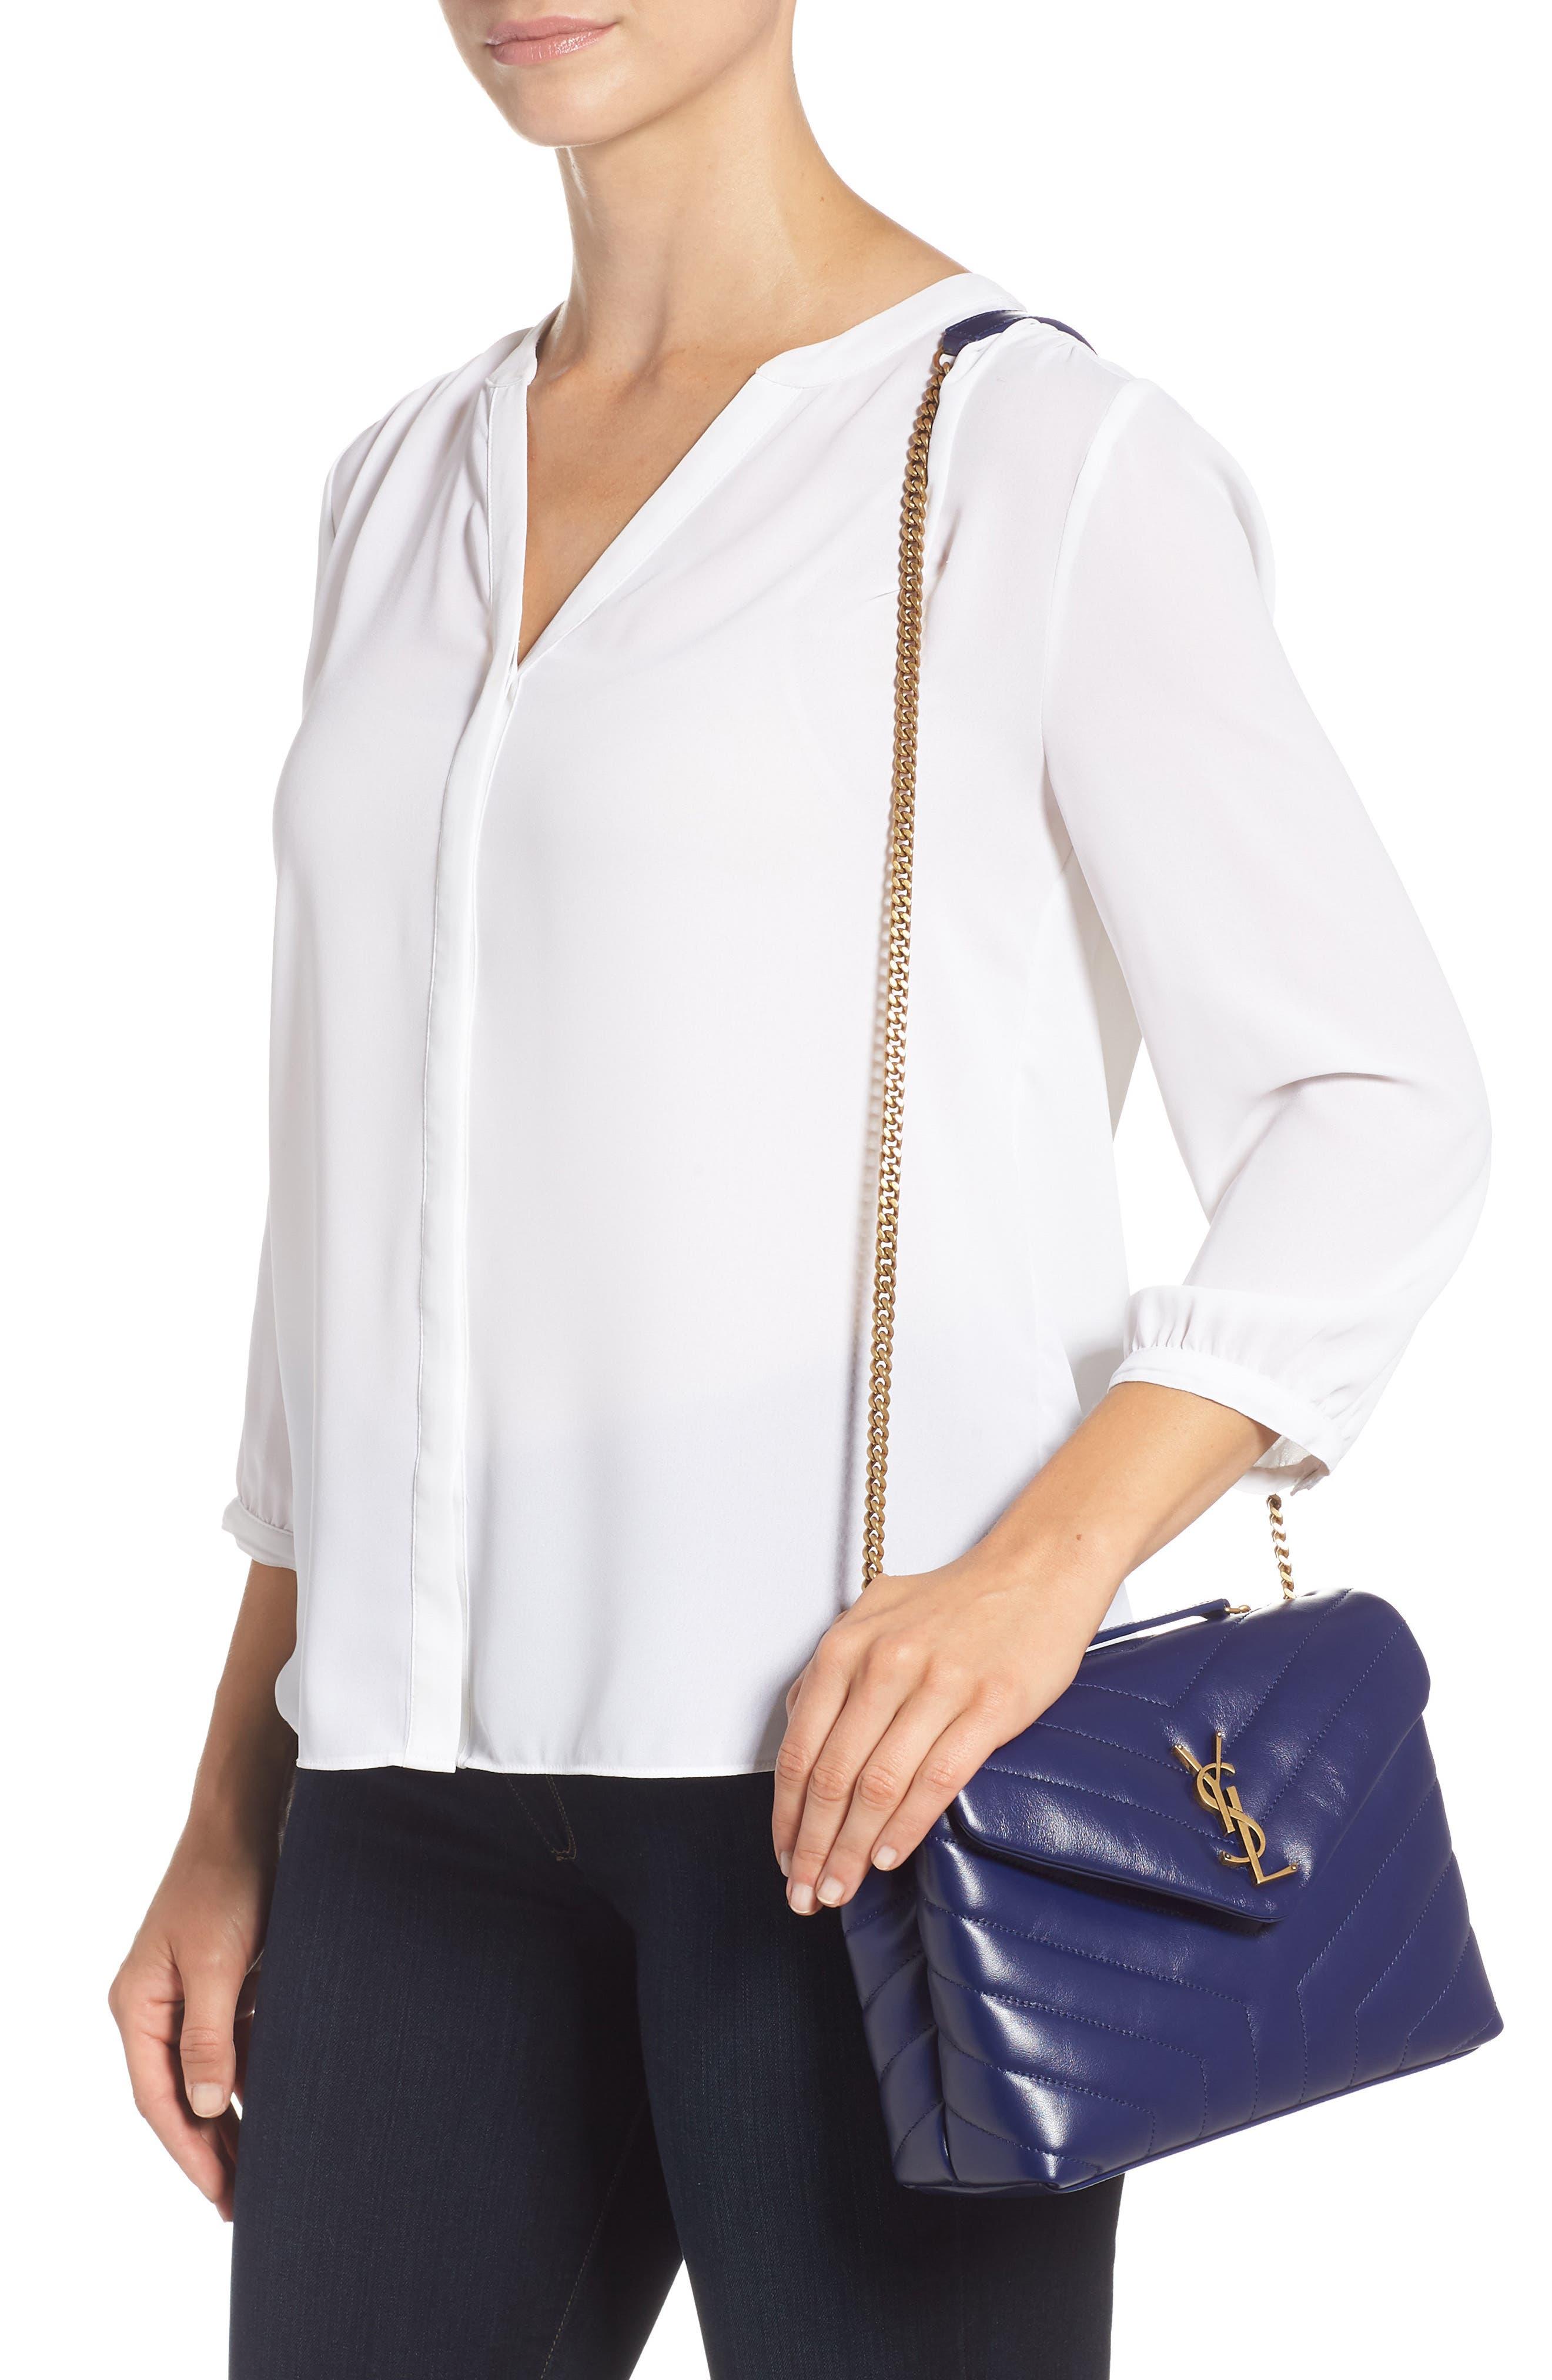 Small Loulou Leather Shoulder Bag,                             Alternate thumbnail 2, color,                             SAPHIR